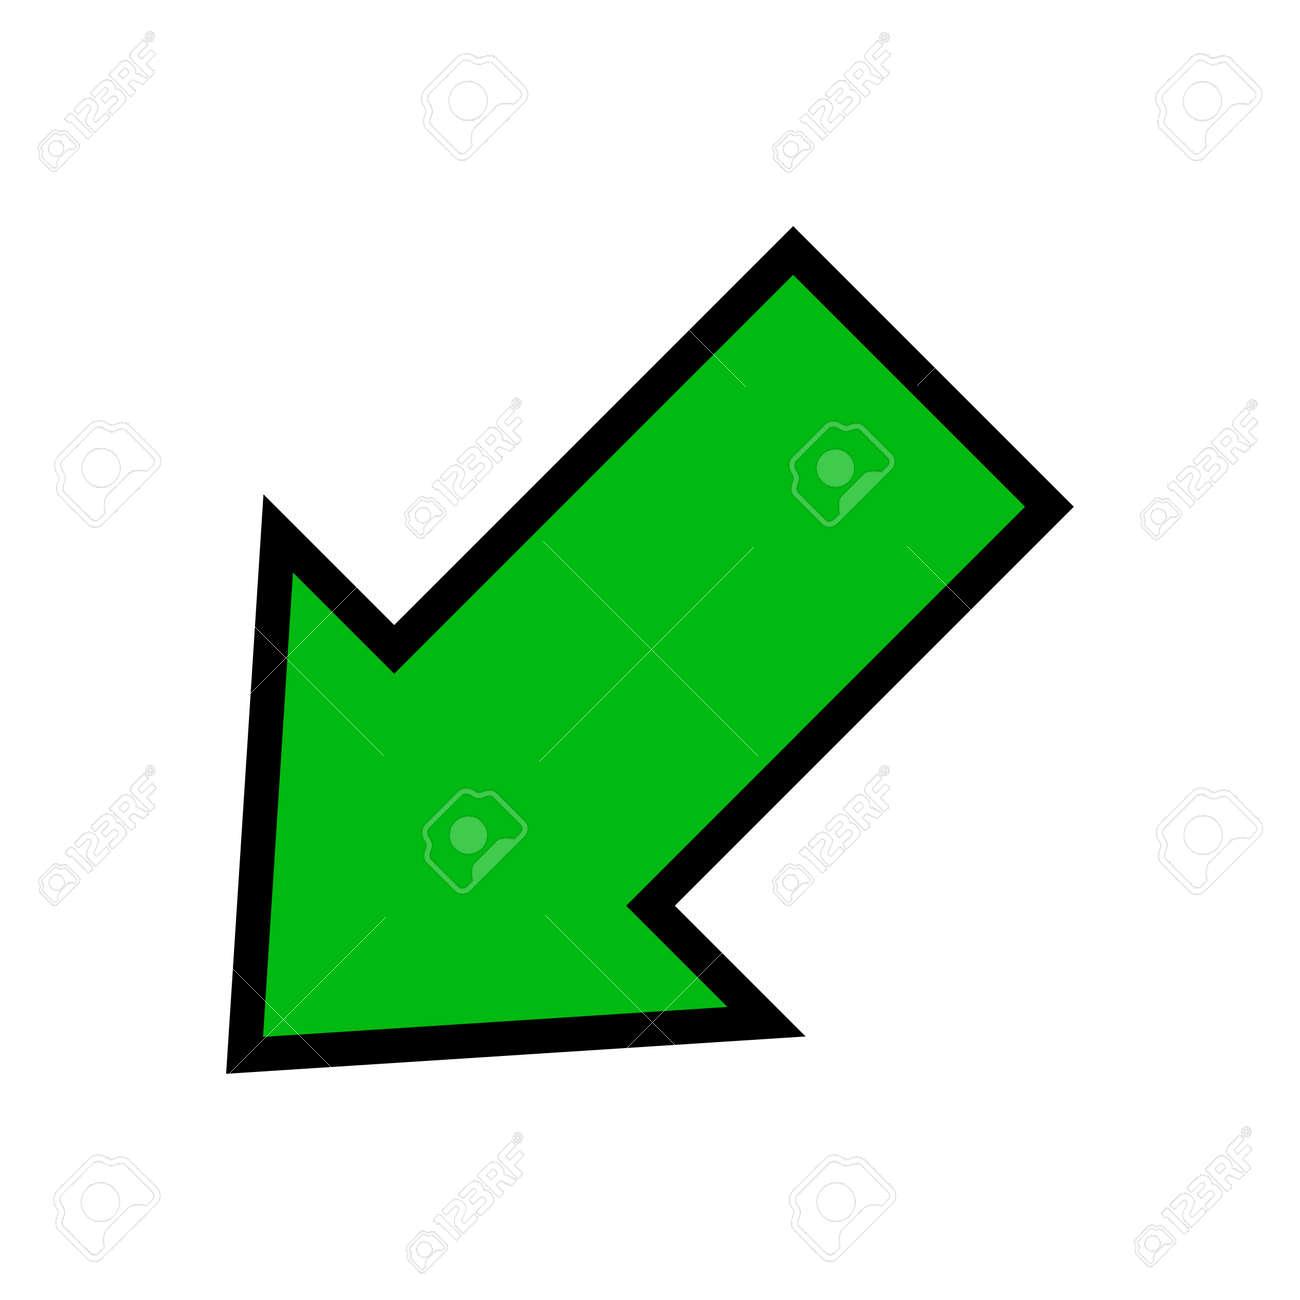 single green arrow, diagonal arrow sign left down isolated on white - 169183446